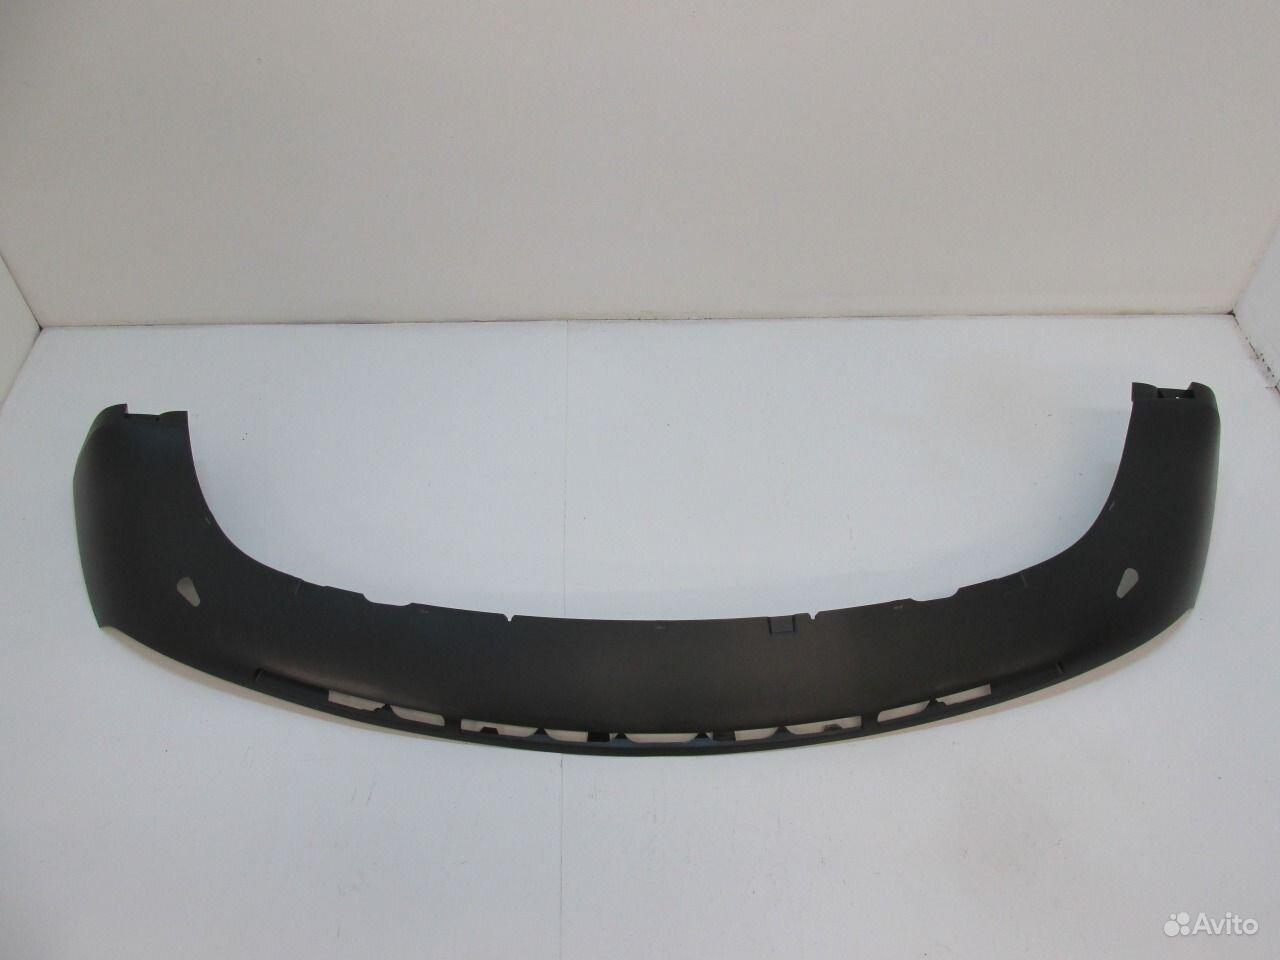 Юбка на задний бампер форд мондео 4 10 фотография